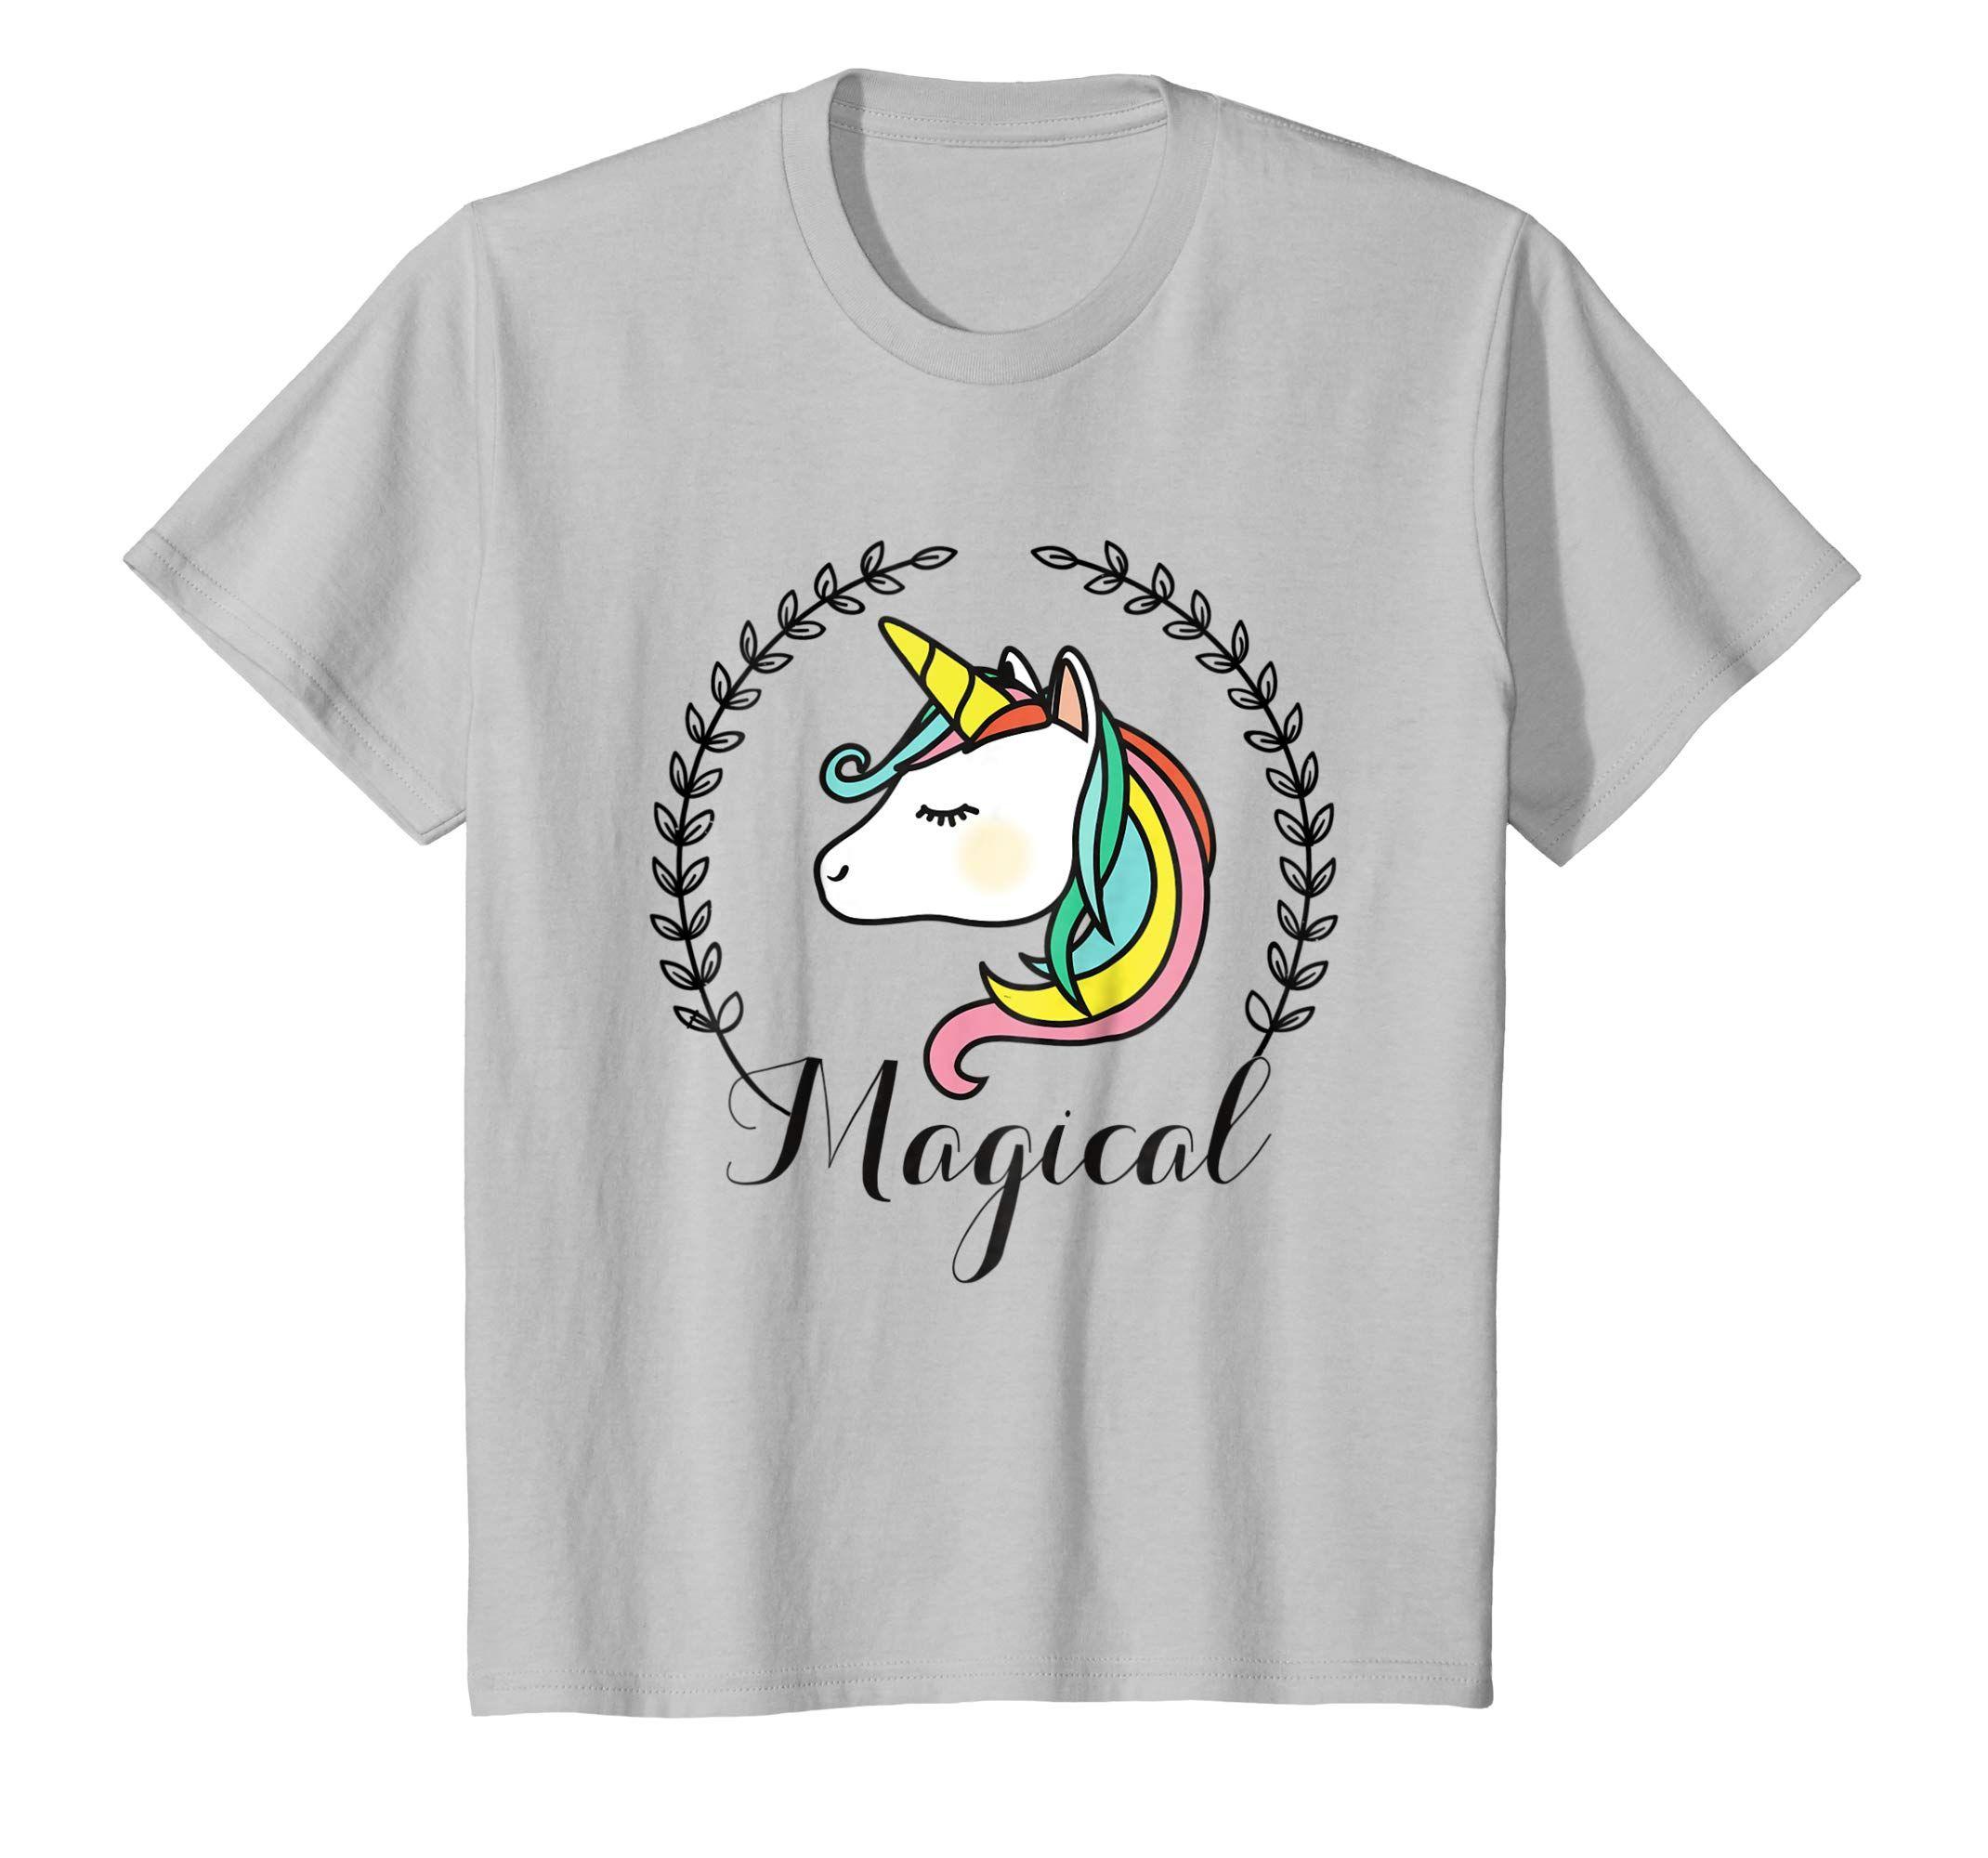 Kids Unicorn Shirt for Girls Birthday Apparel